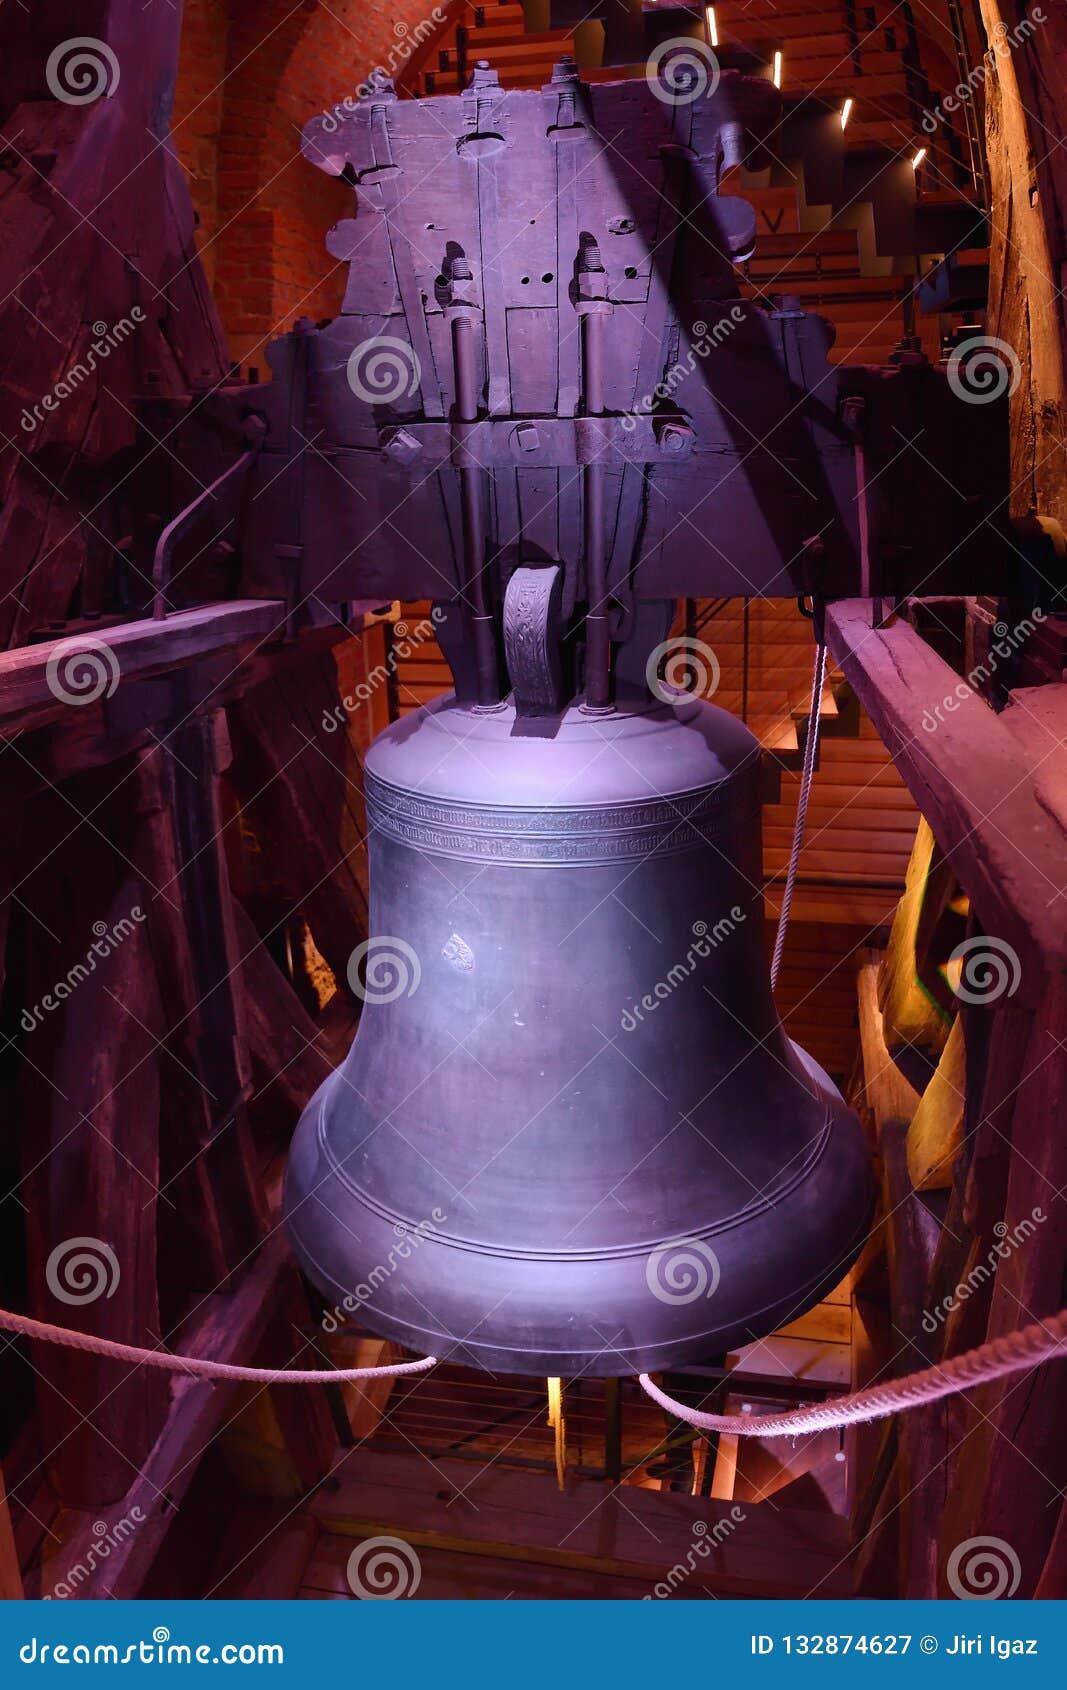 Hradec Kralove, Czech republic - November 17, 2018: big bell in Bila vez tower in day 29th anniversary of the Velvet Revolution